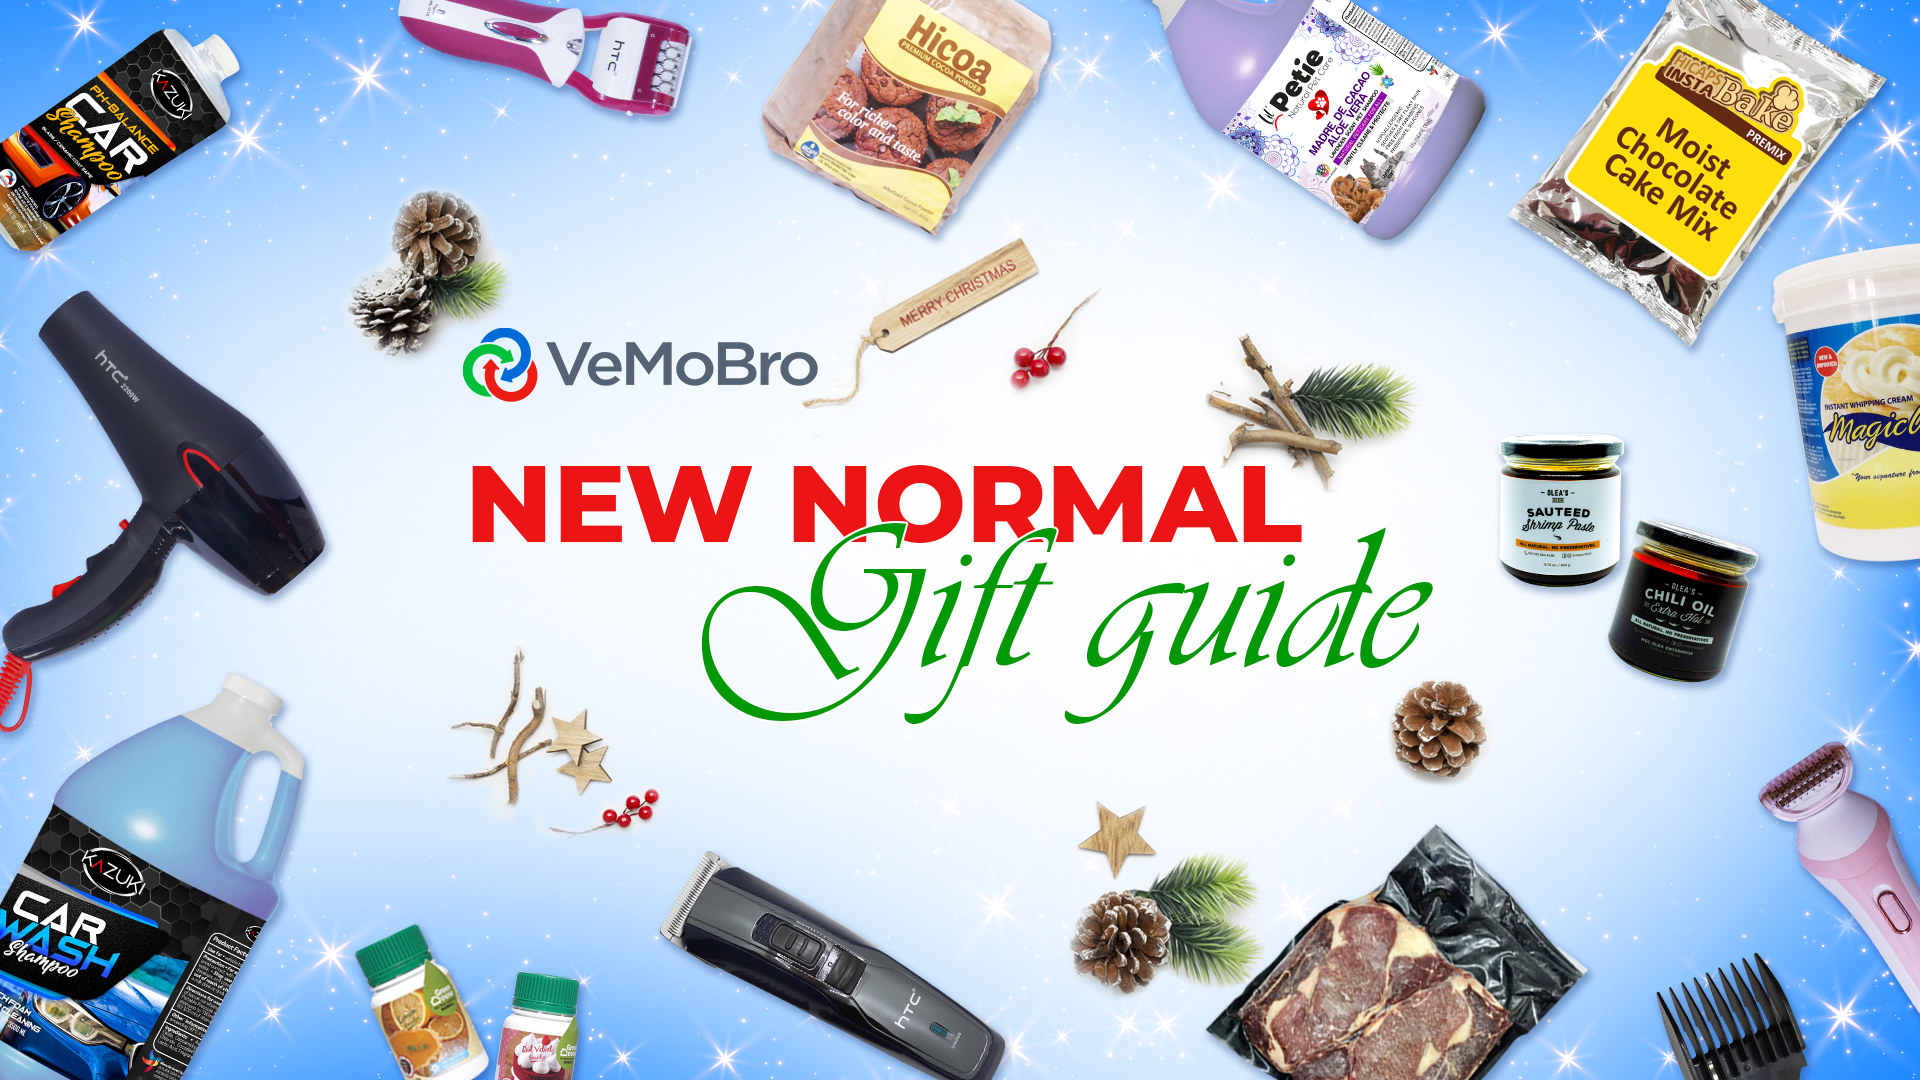 New Normal Gift Ideas Vemebro PhilippinesNew Normal Gift Ideas Vemebro Philippines